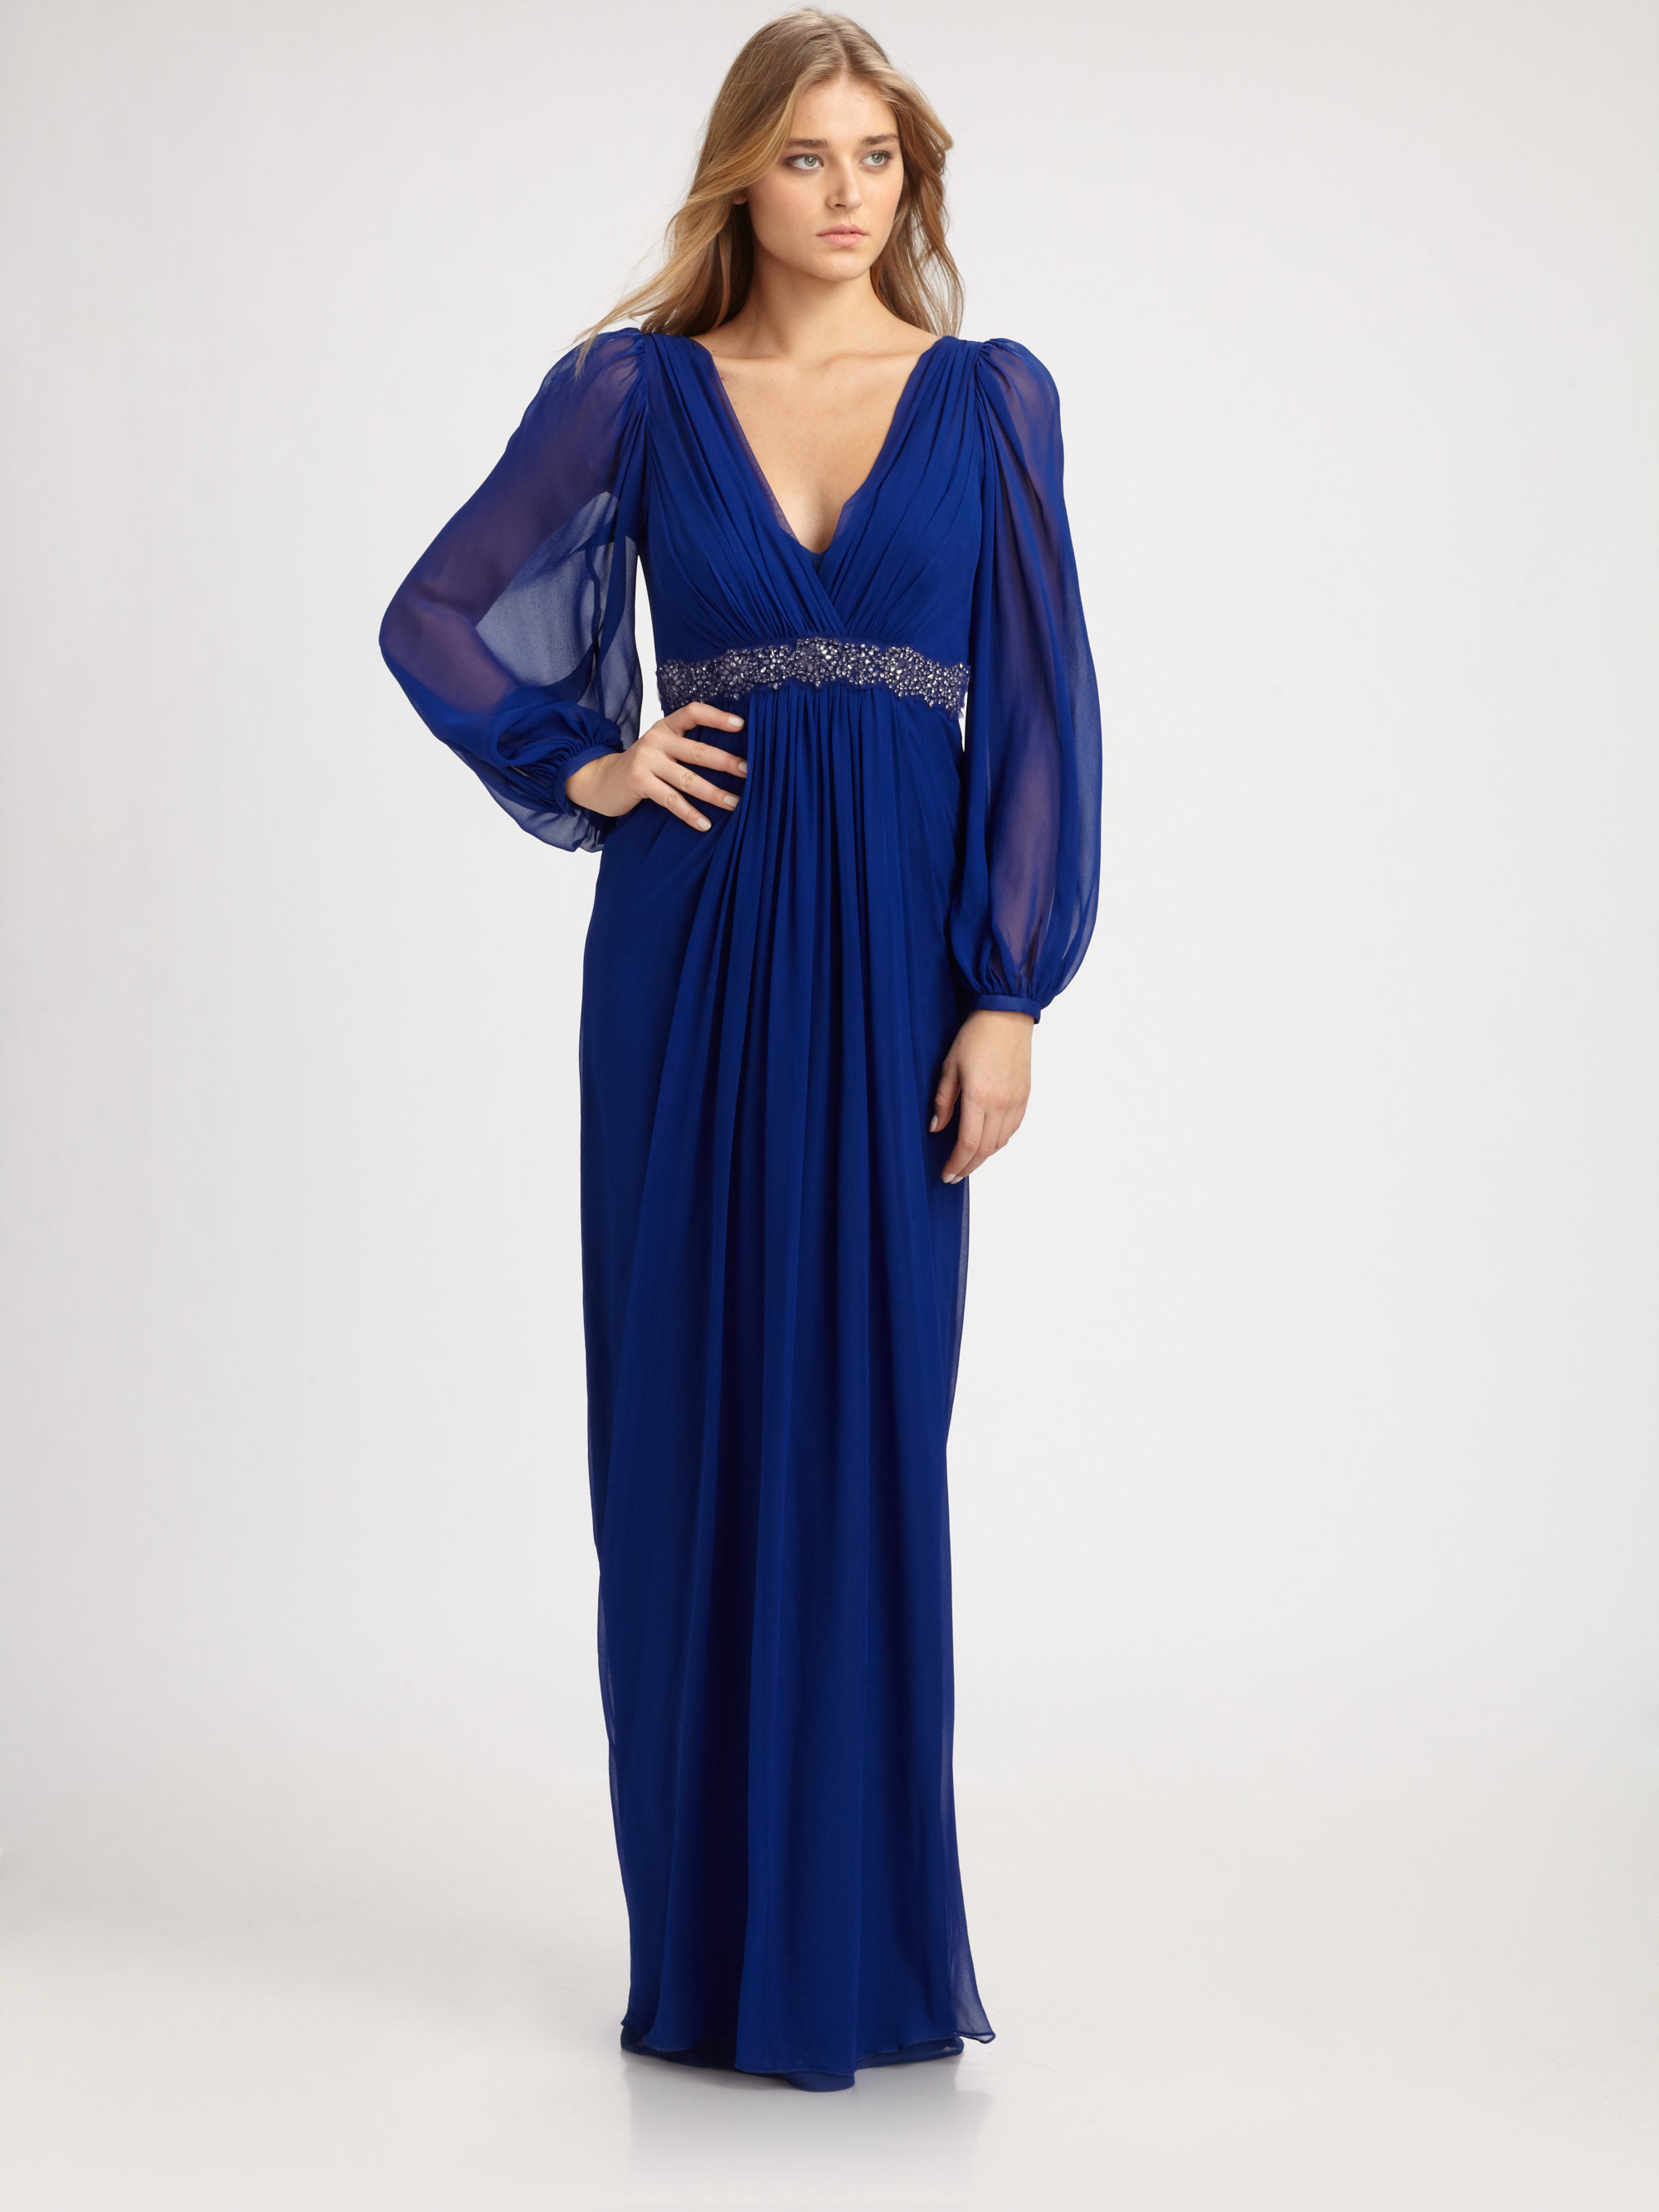 Teri jon Silk Gown in Blue  Lyst